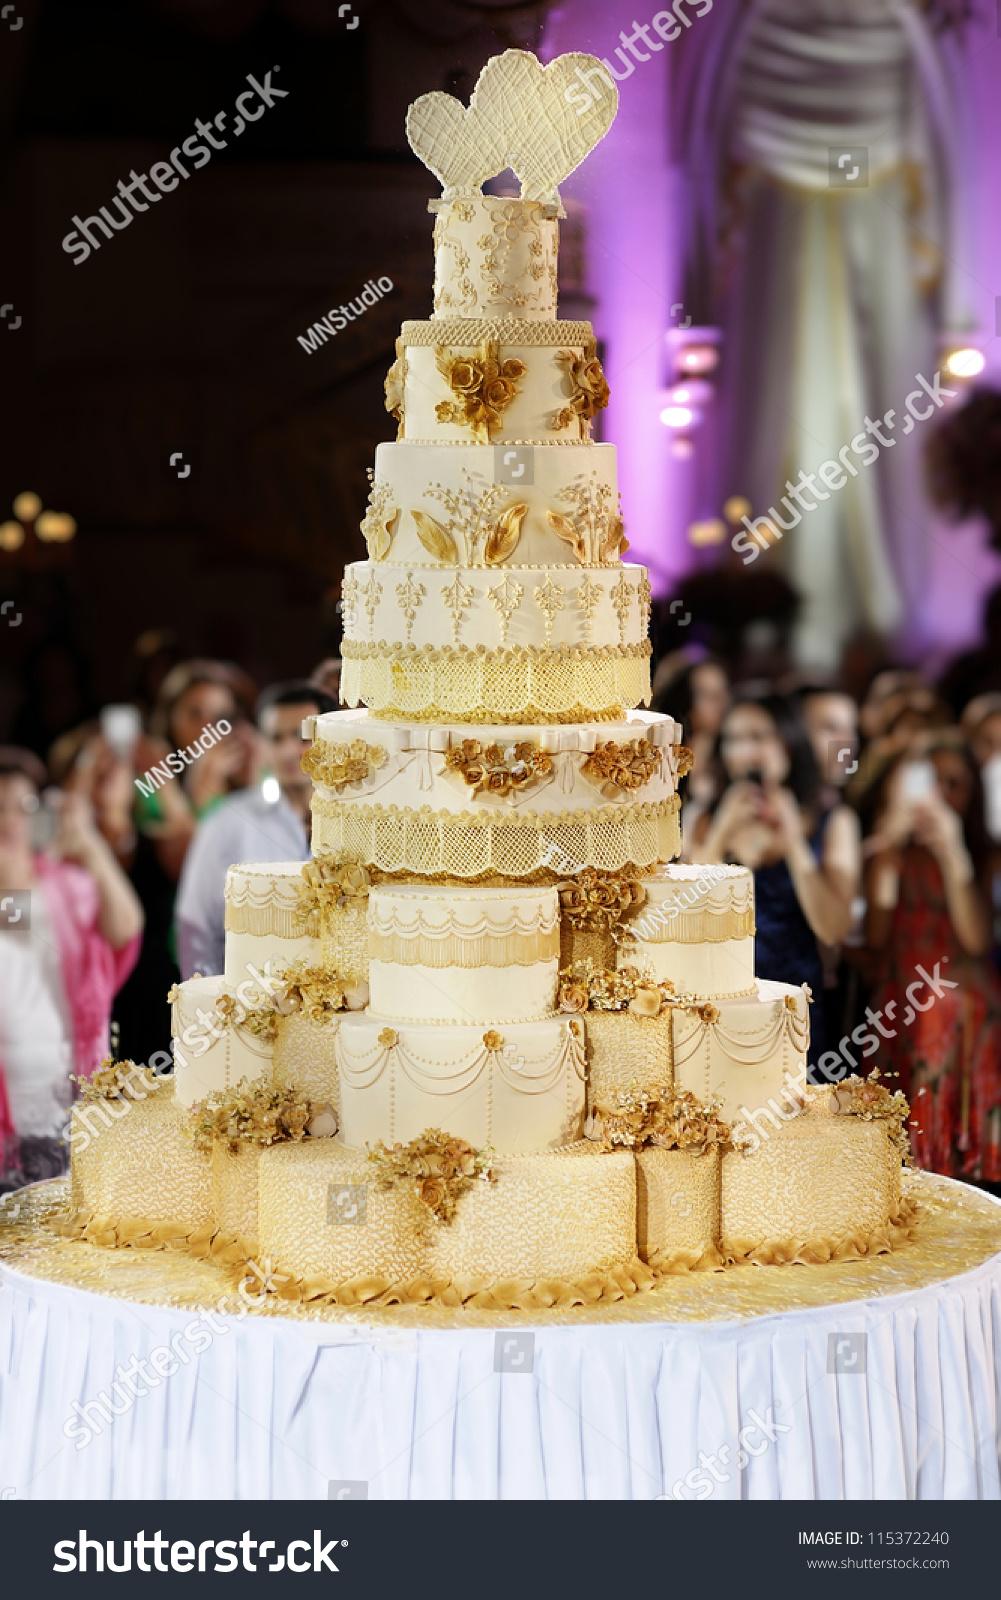 The Biggest Wedding Cake Ever